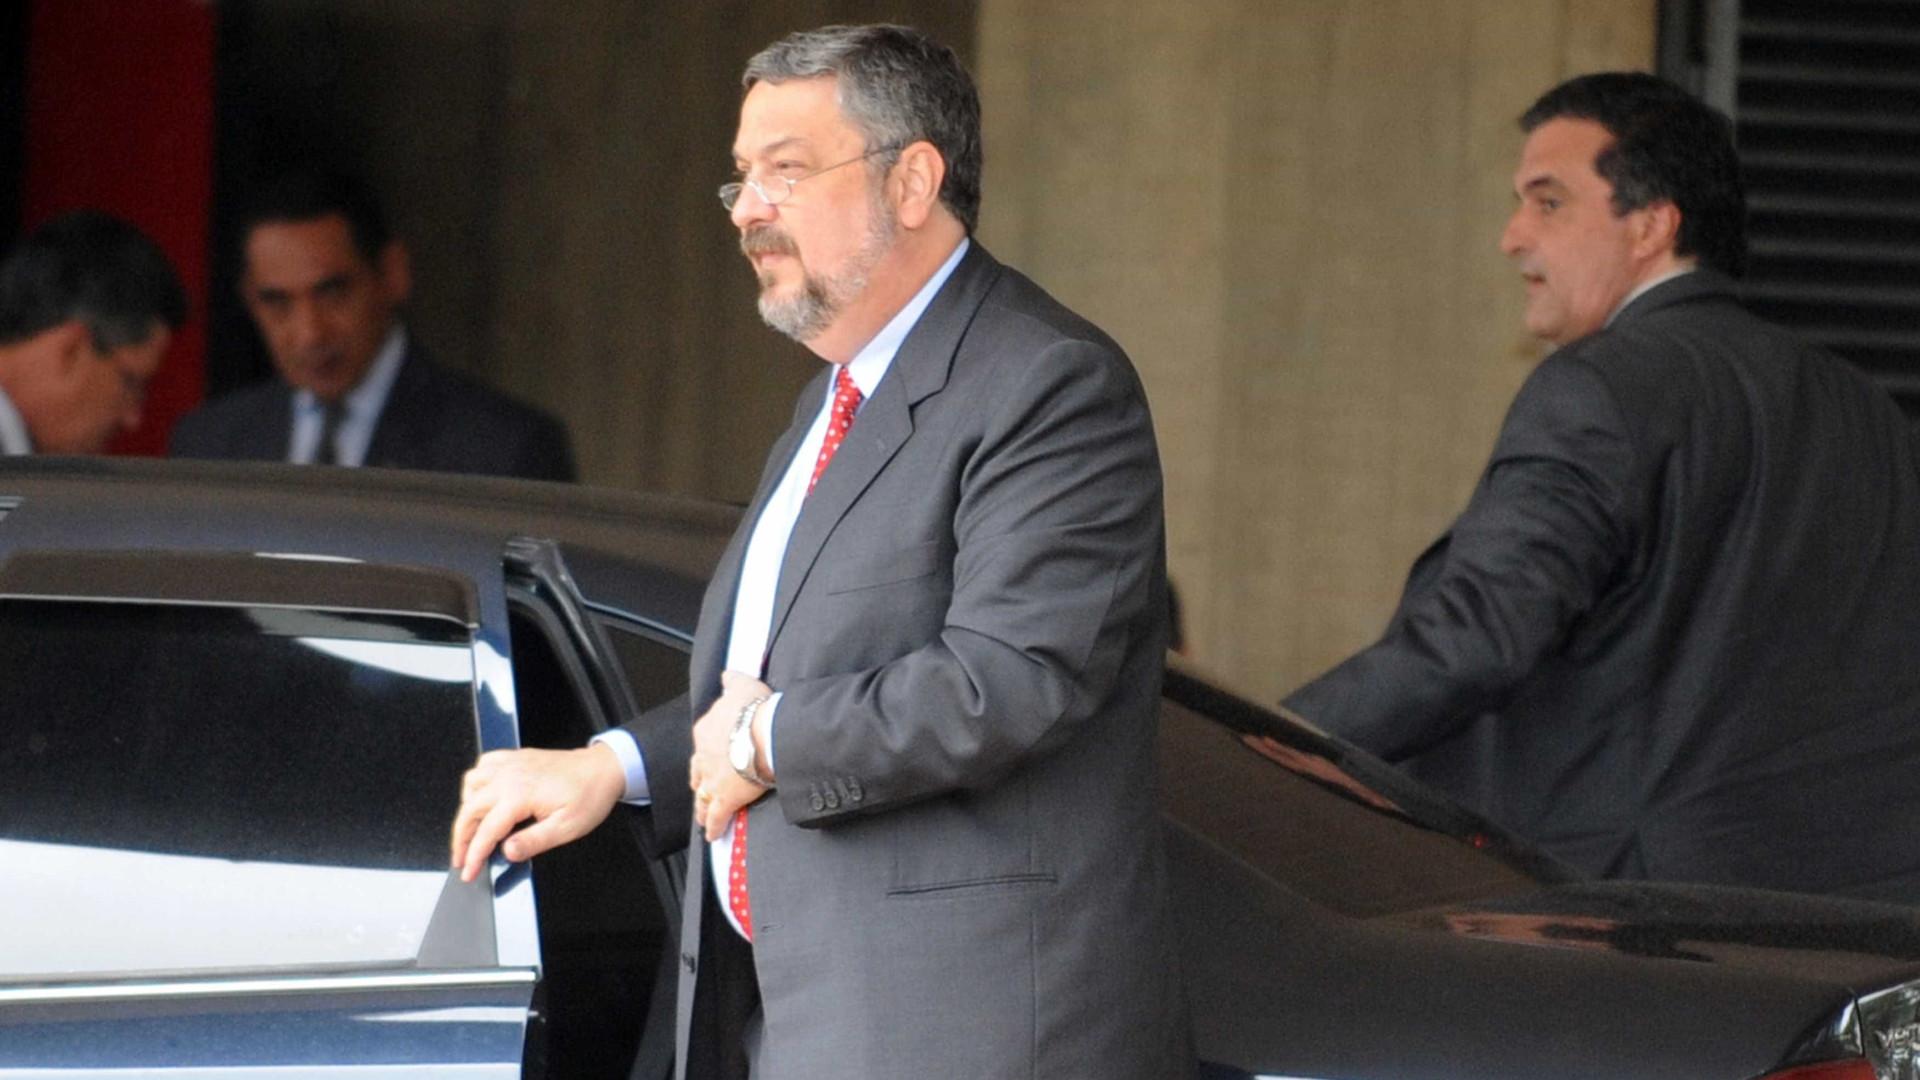 Palocci deixa carceragem para cumprir prisão domiciliar